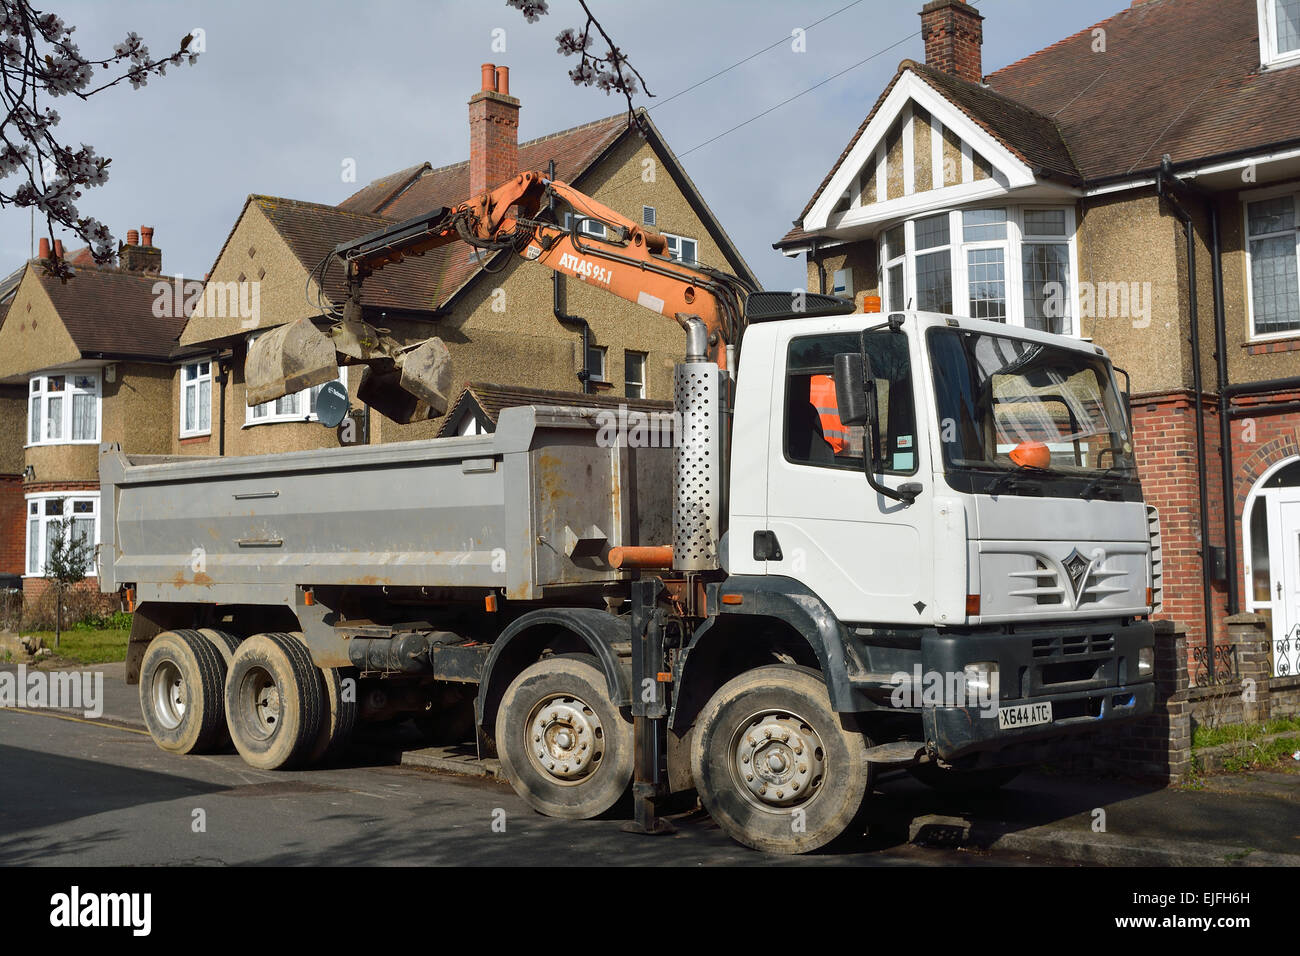 Dumper Truck Lorry Stock Photos & Dumper Truck Lorry Stock